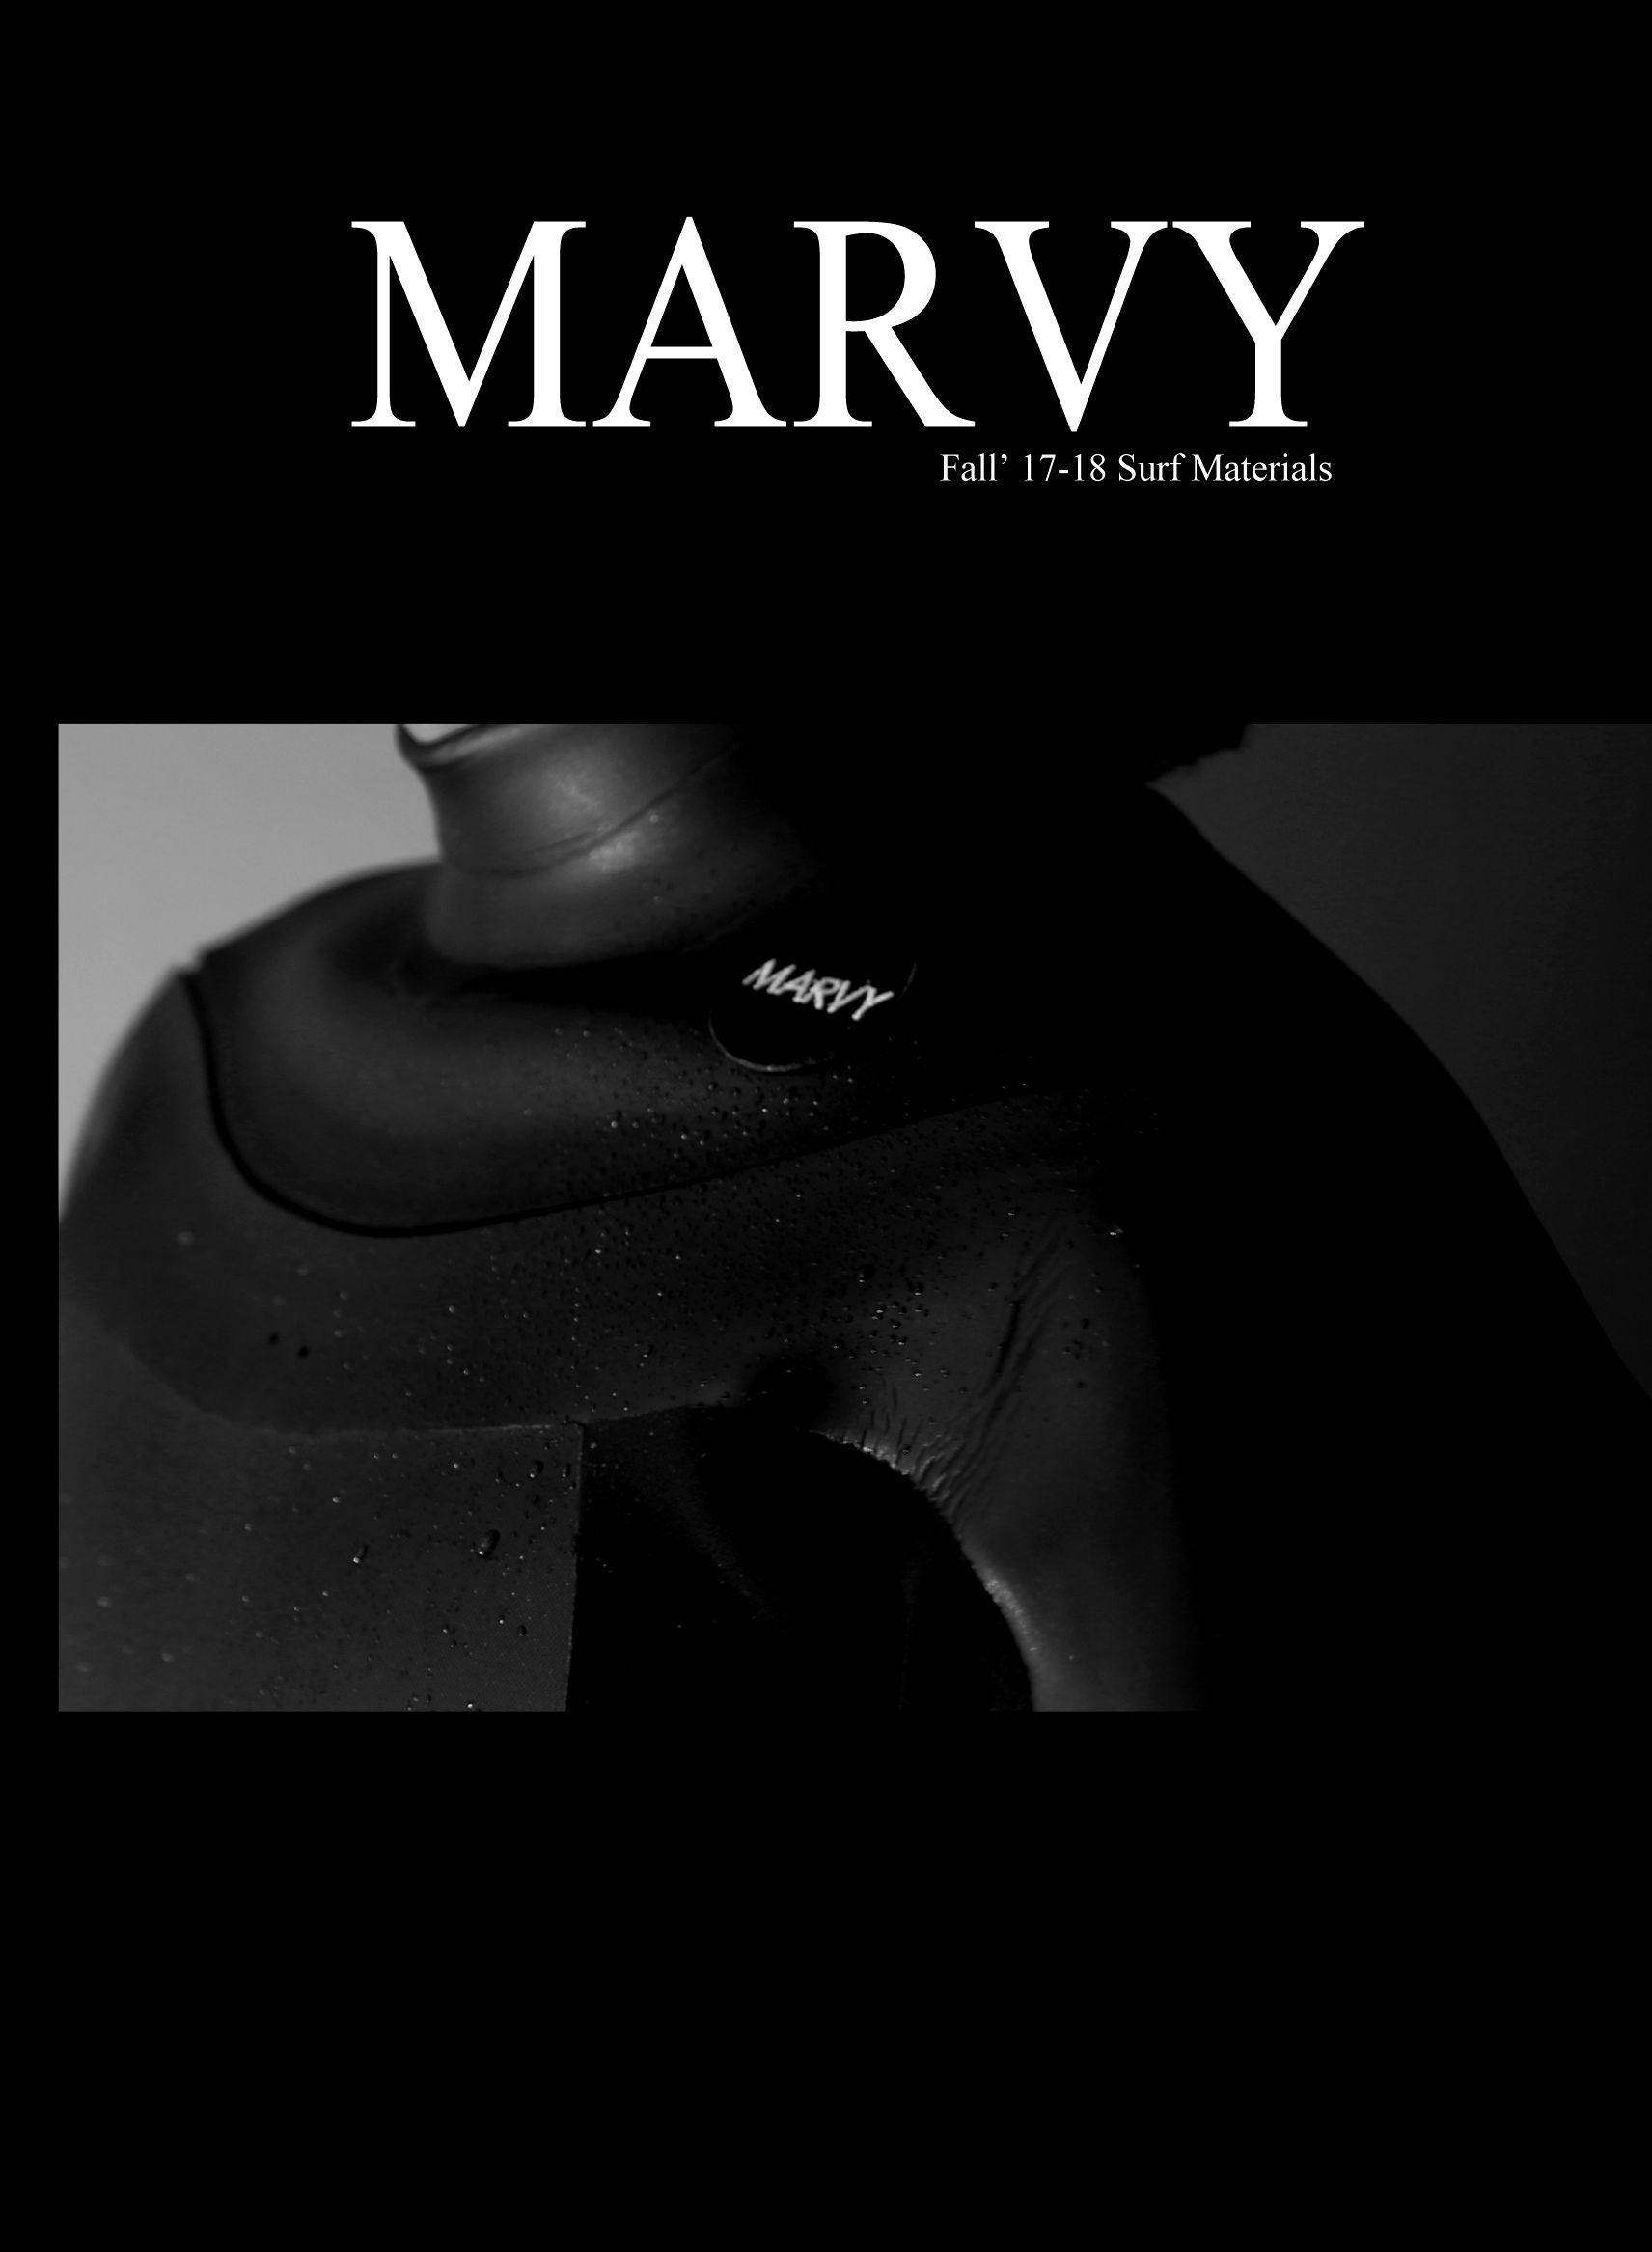 2017FW_MARVY_P01.jpg-1